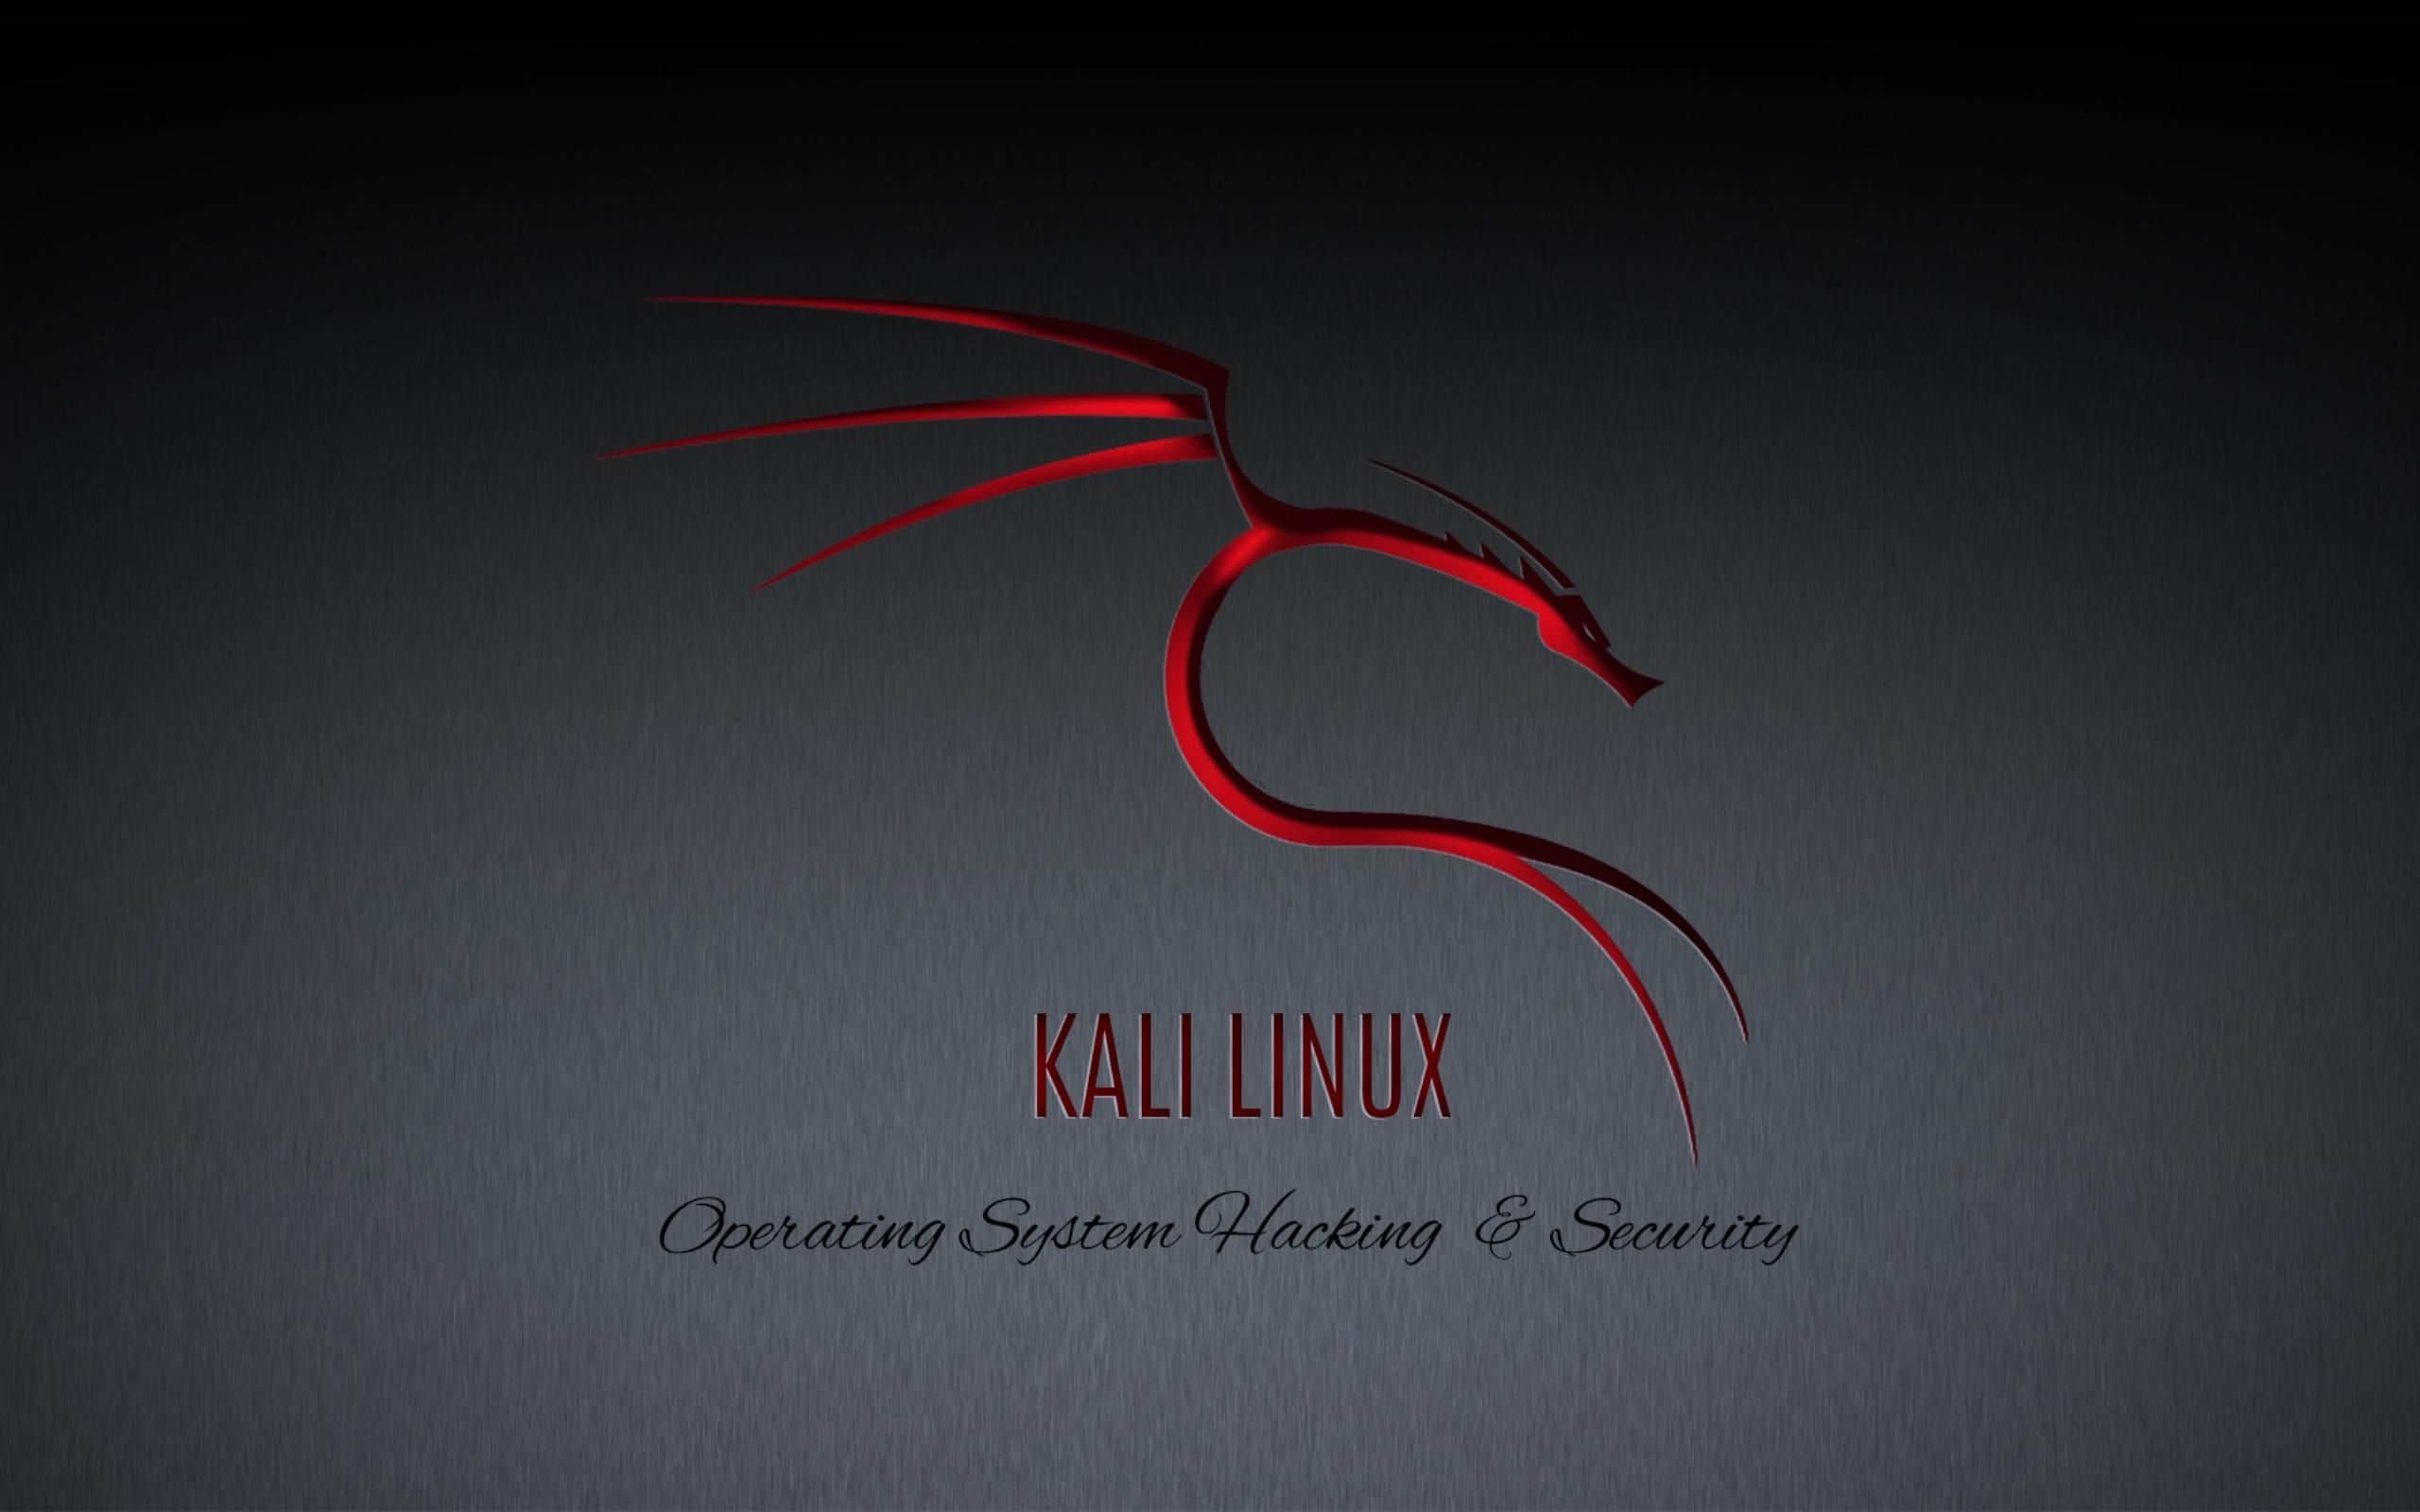 linux hacker background - photo #44